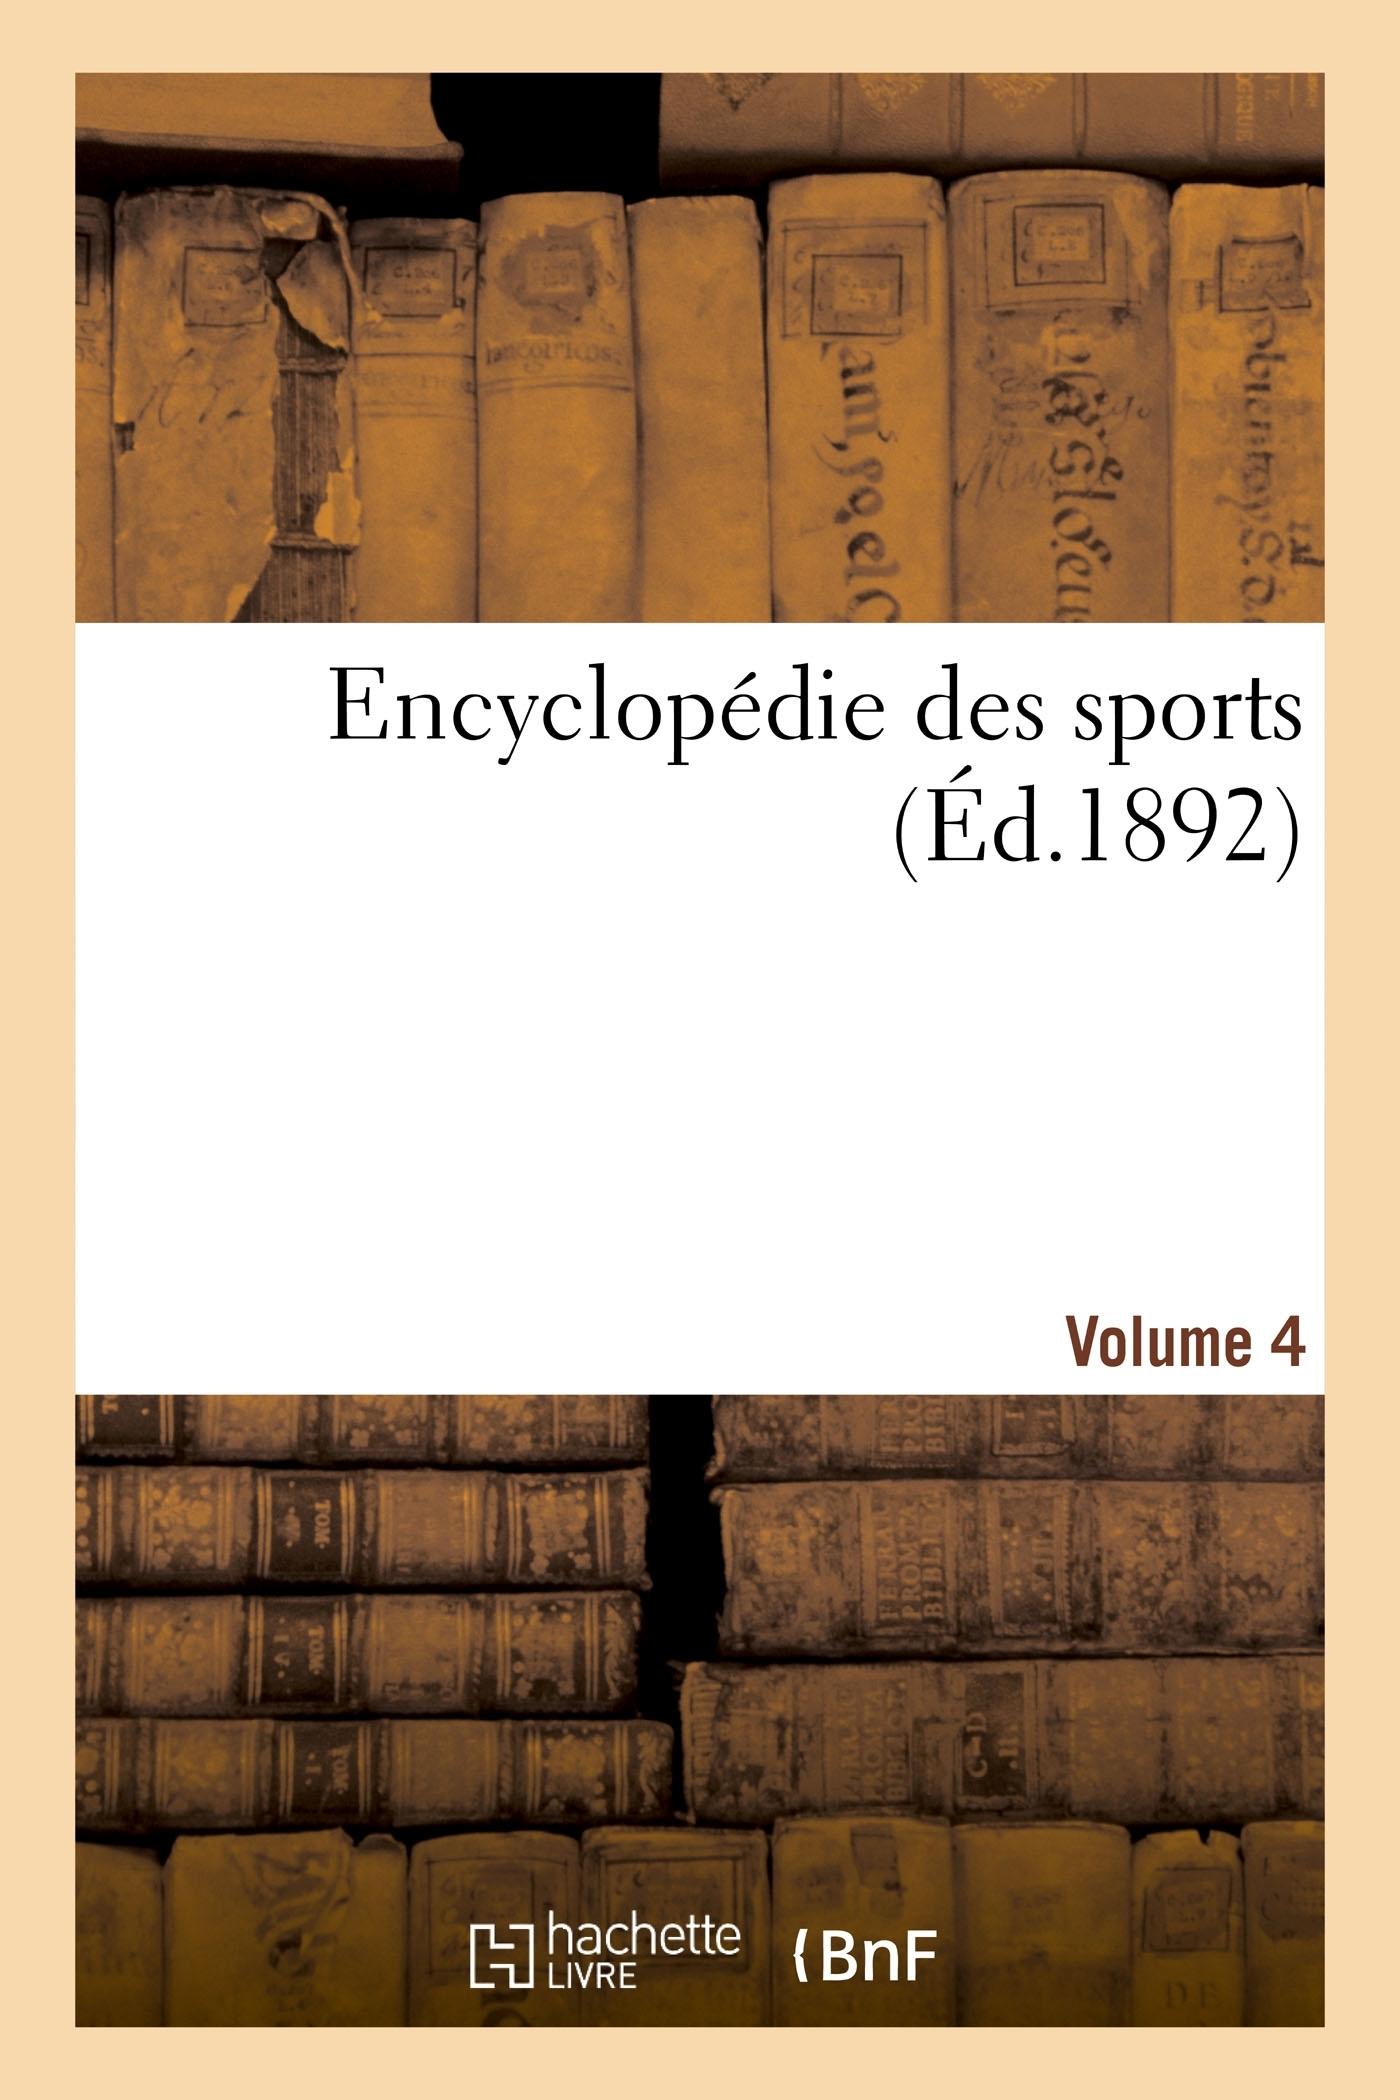 ENCYCLOPEDIE DES SPORTS. VOLUME 4